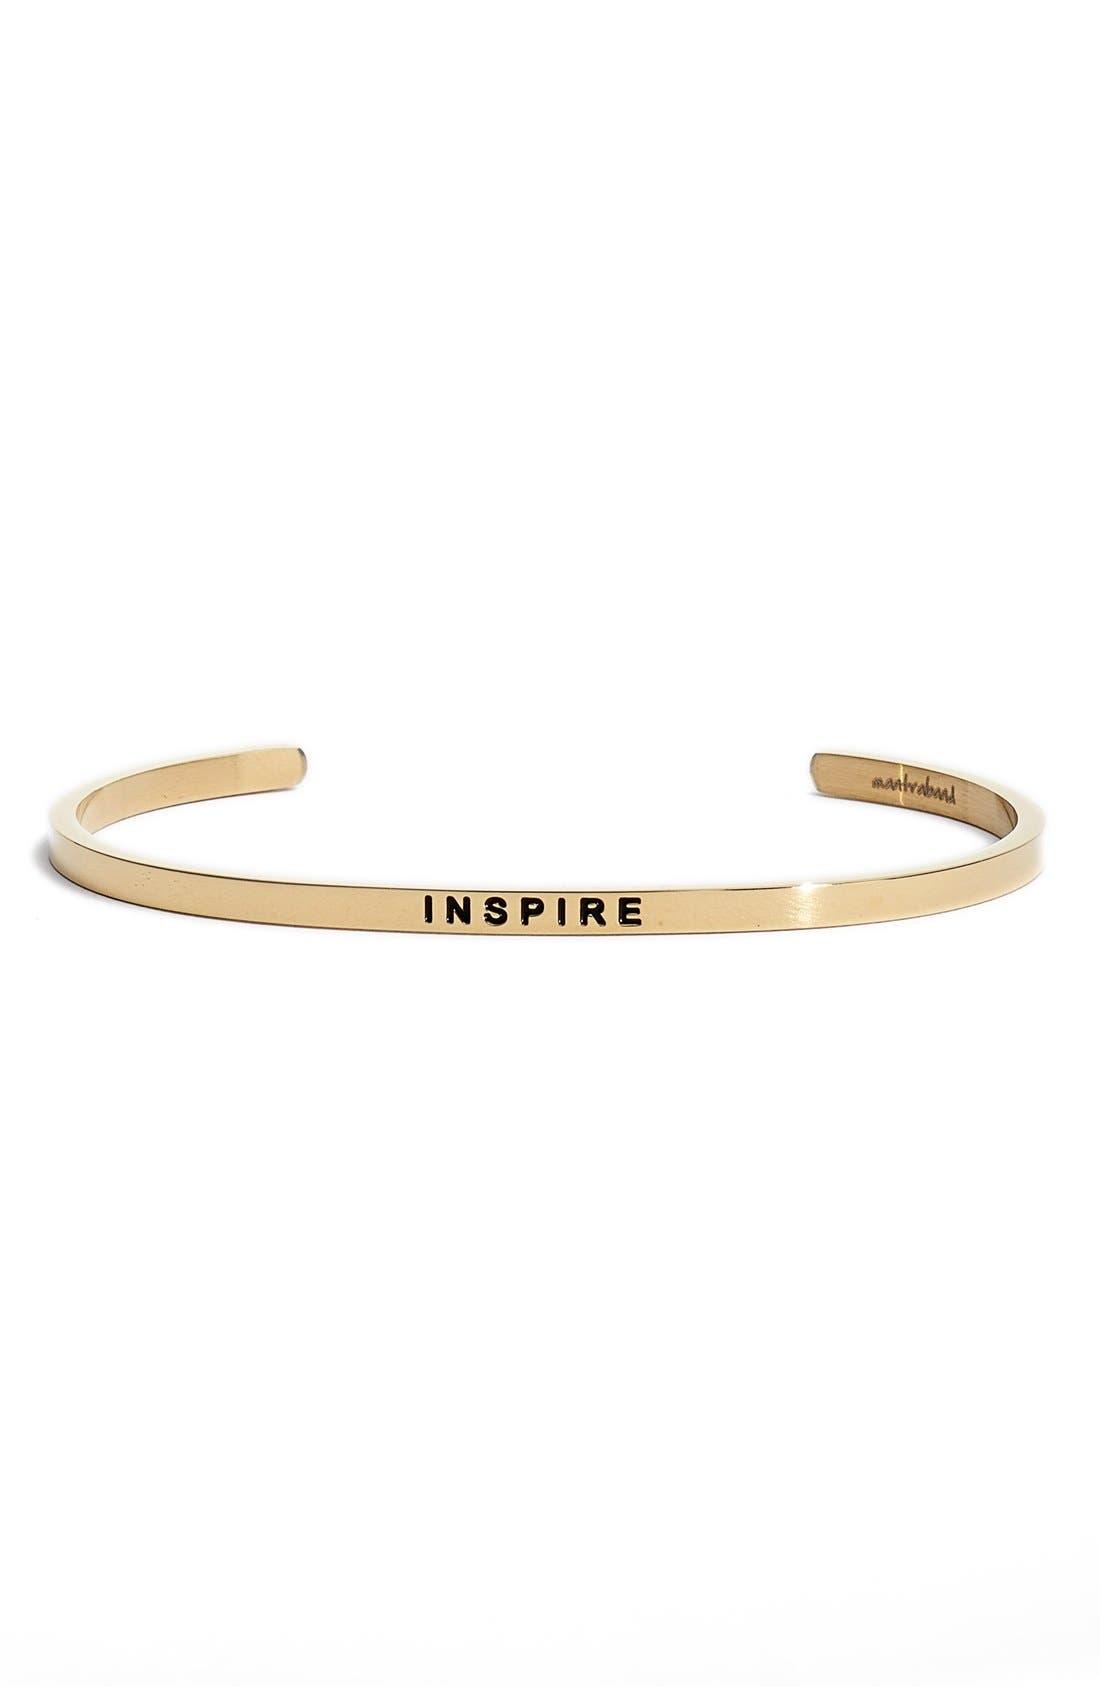 Main Image - Mantraband® 'Inspire' Cuff